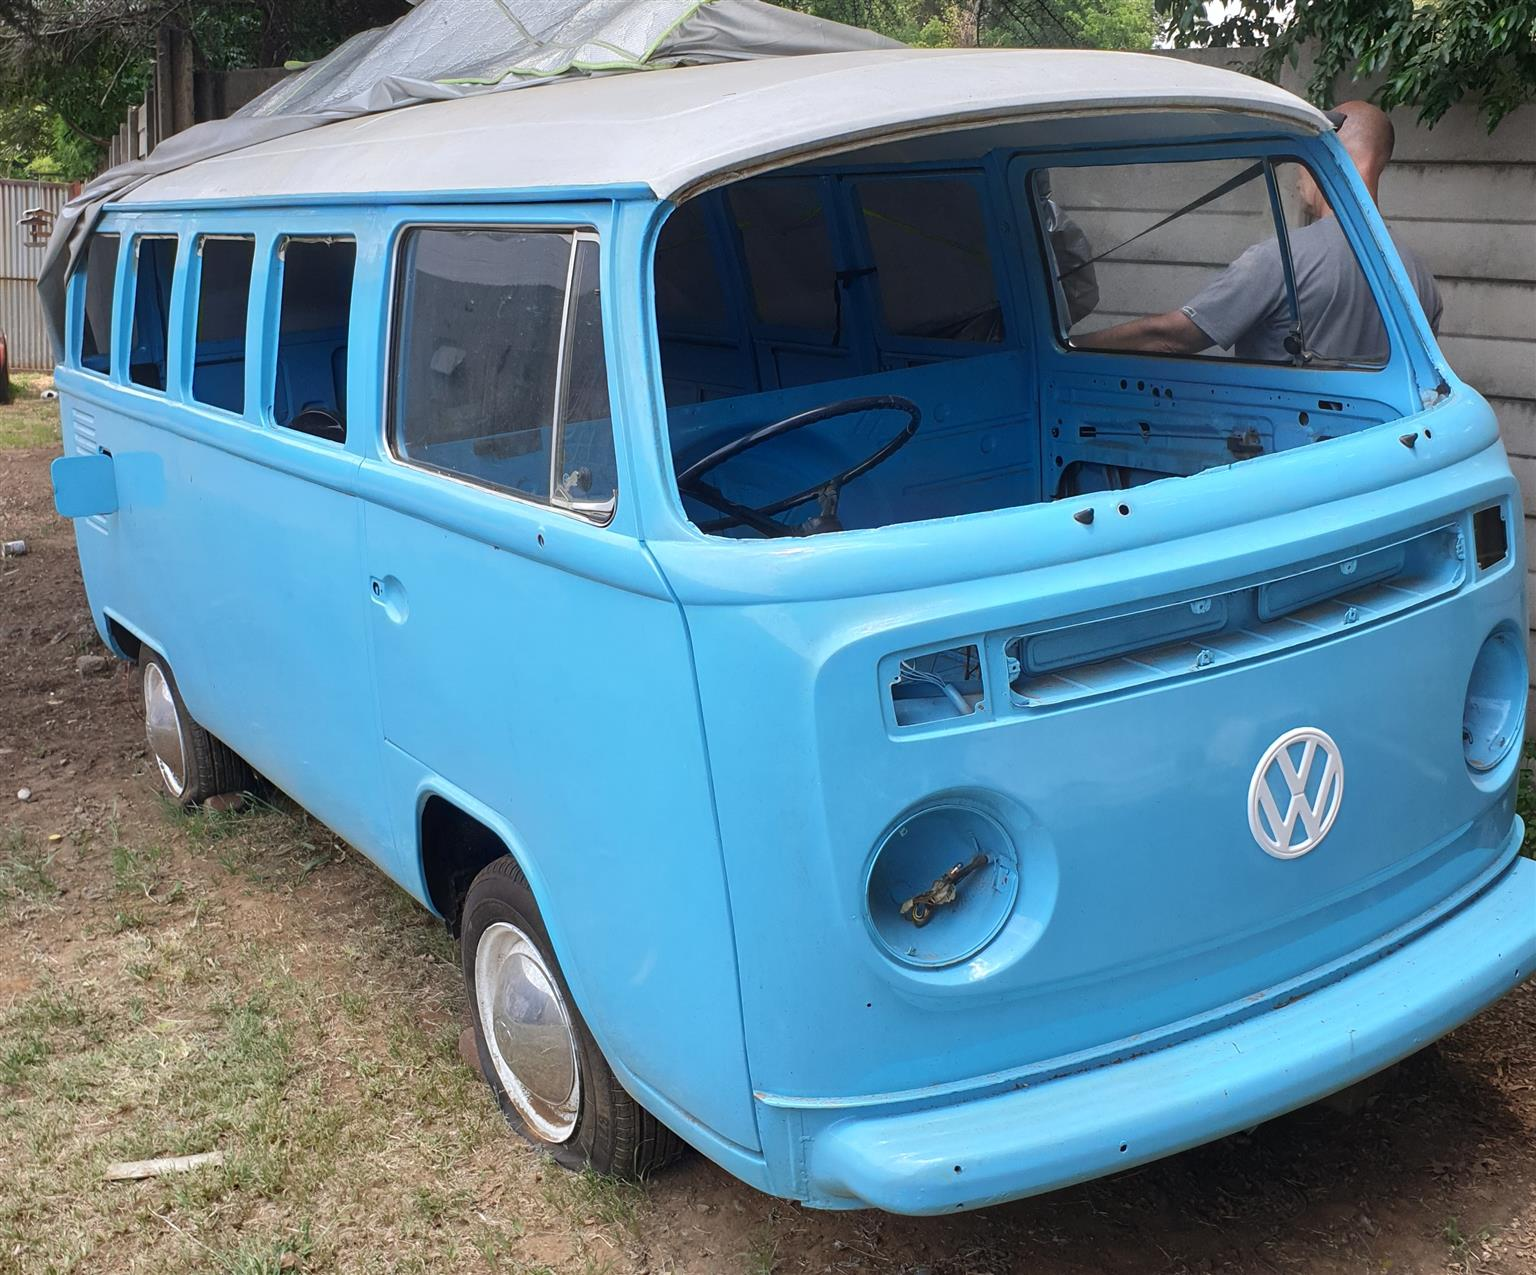 1975 VW Brasilia Bay window bus - partly restored